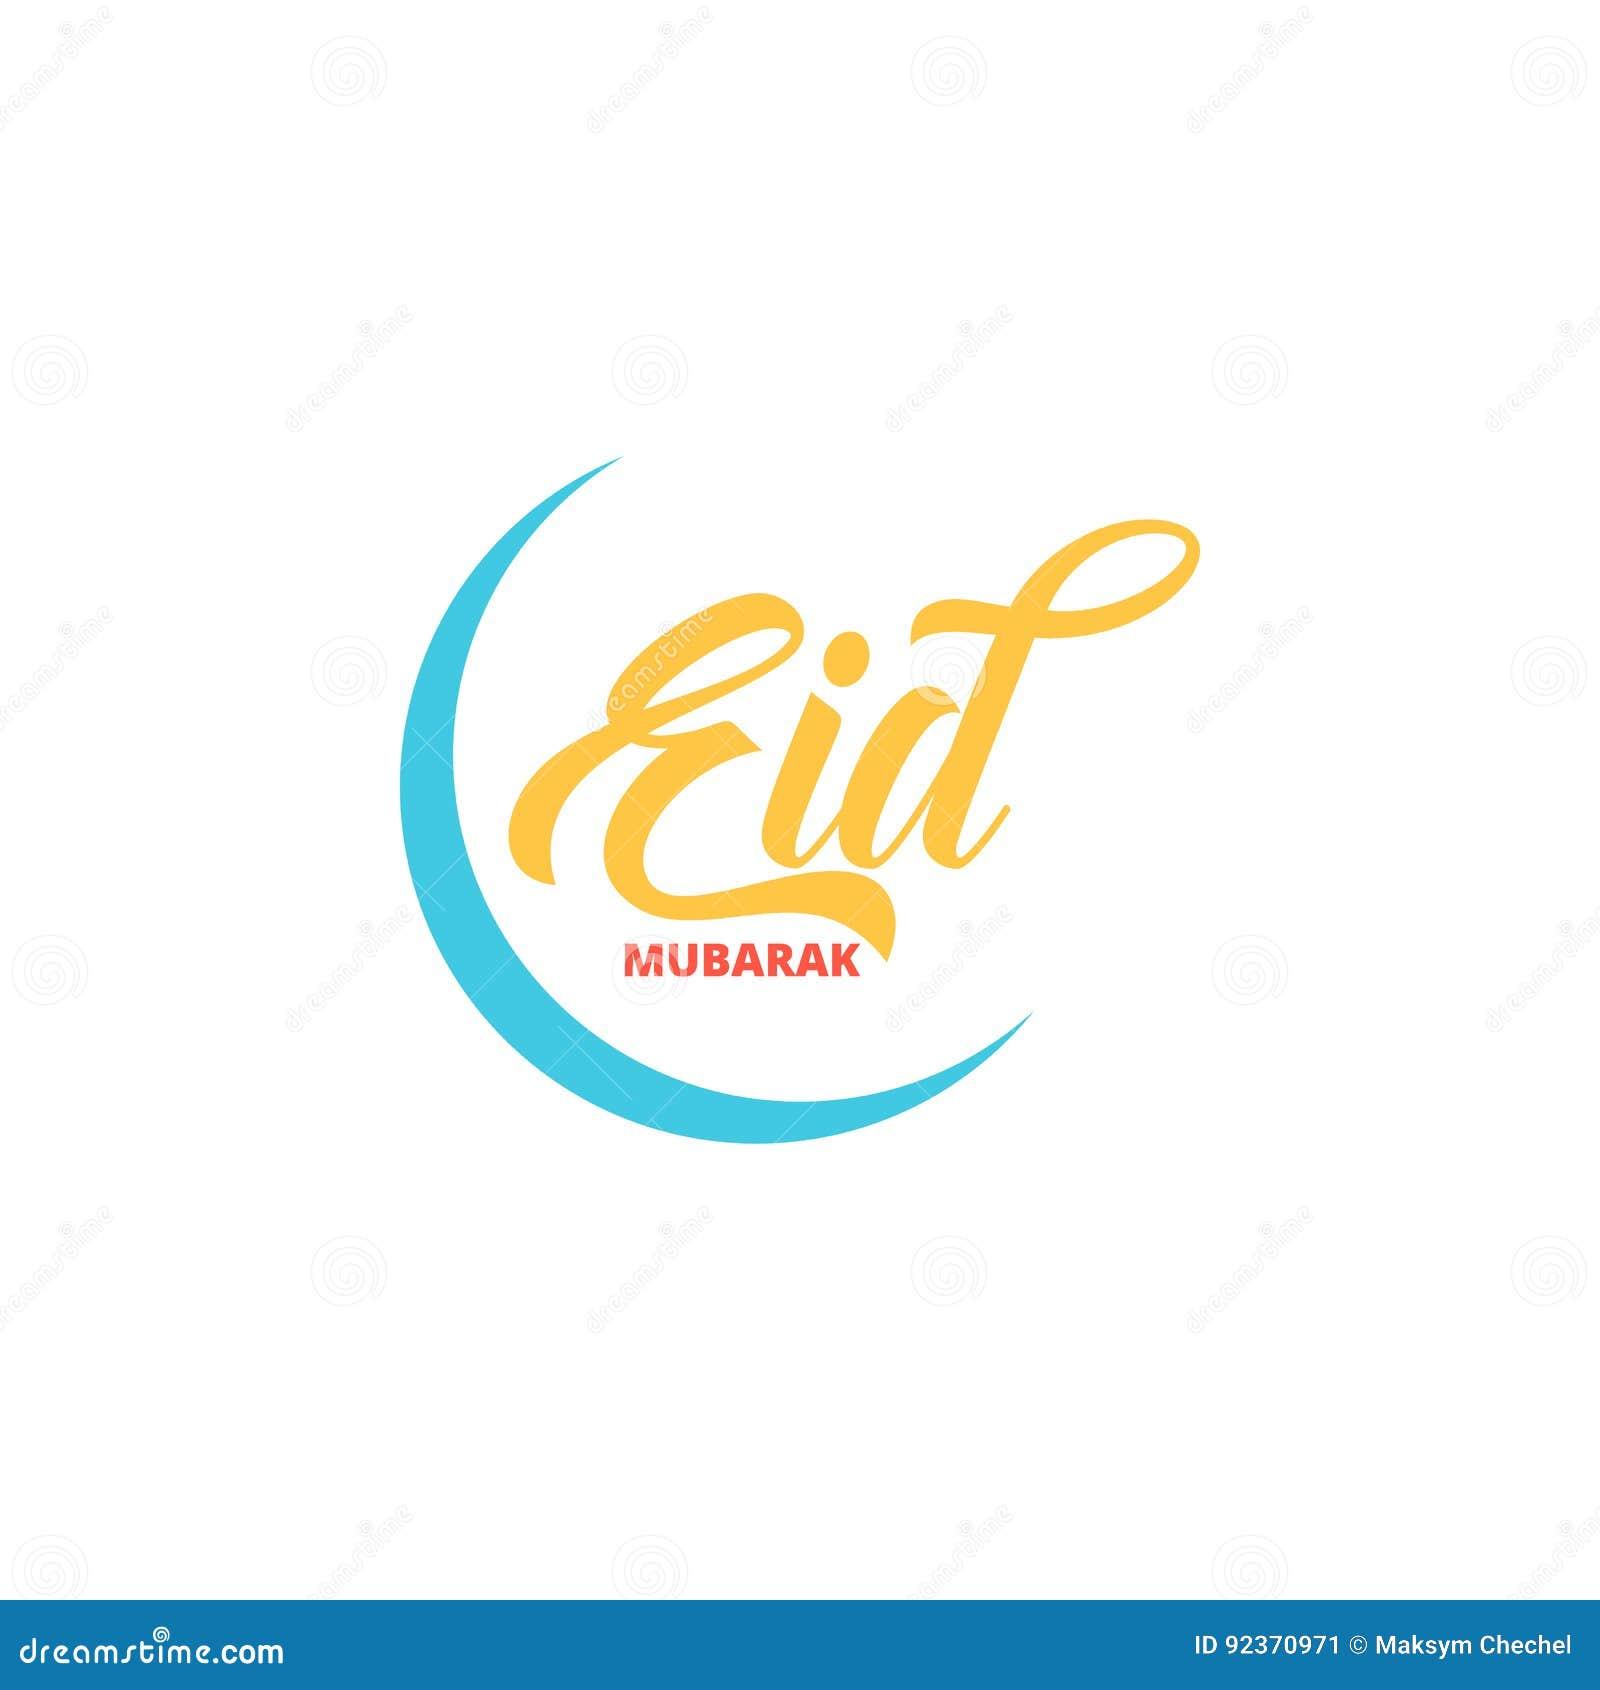 eid mubarak typographic logo design layout for islamic